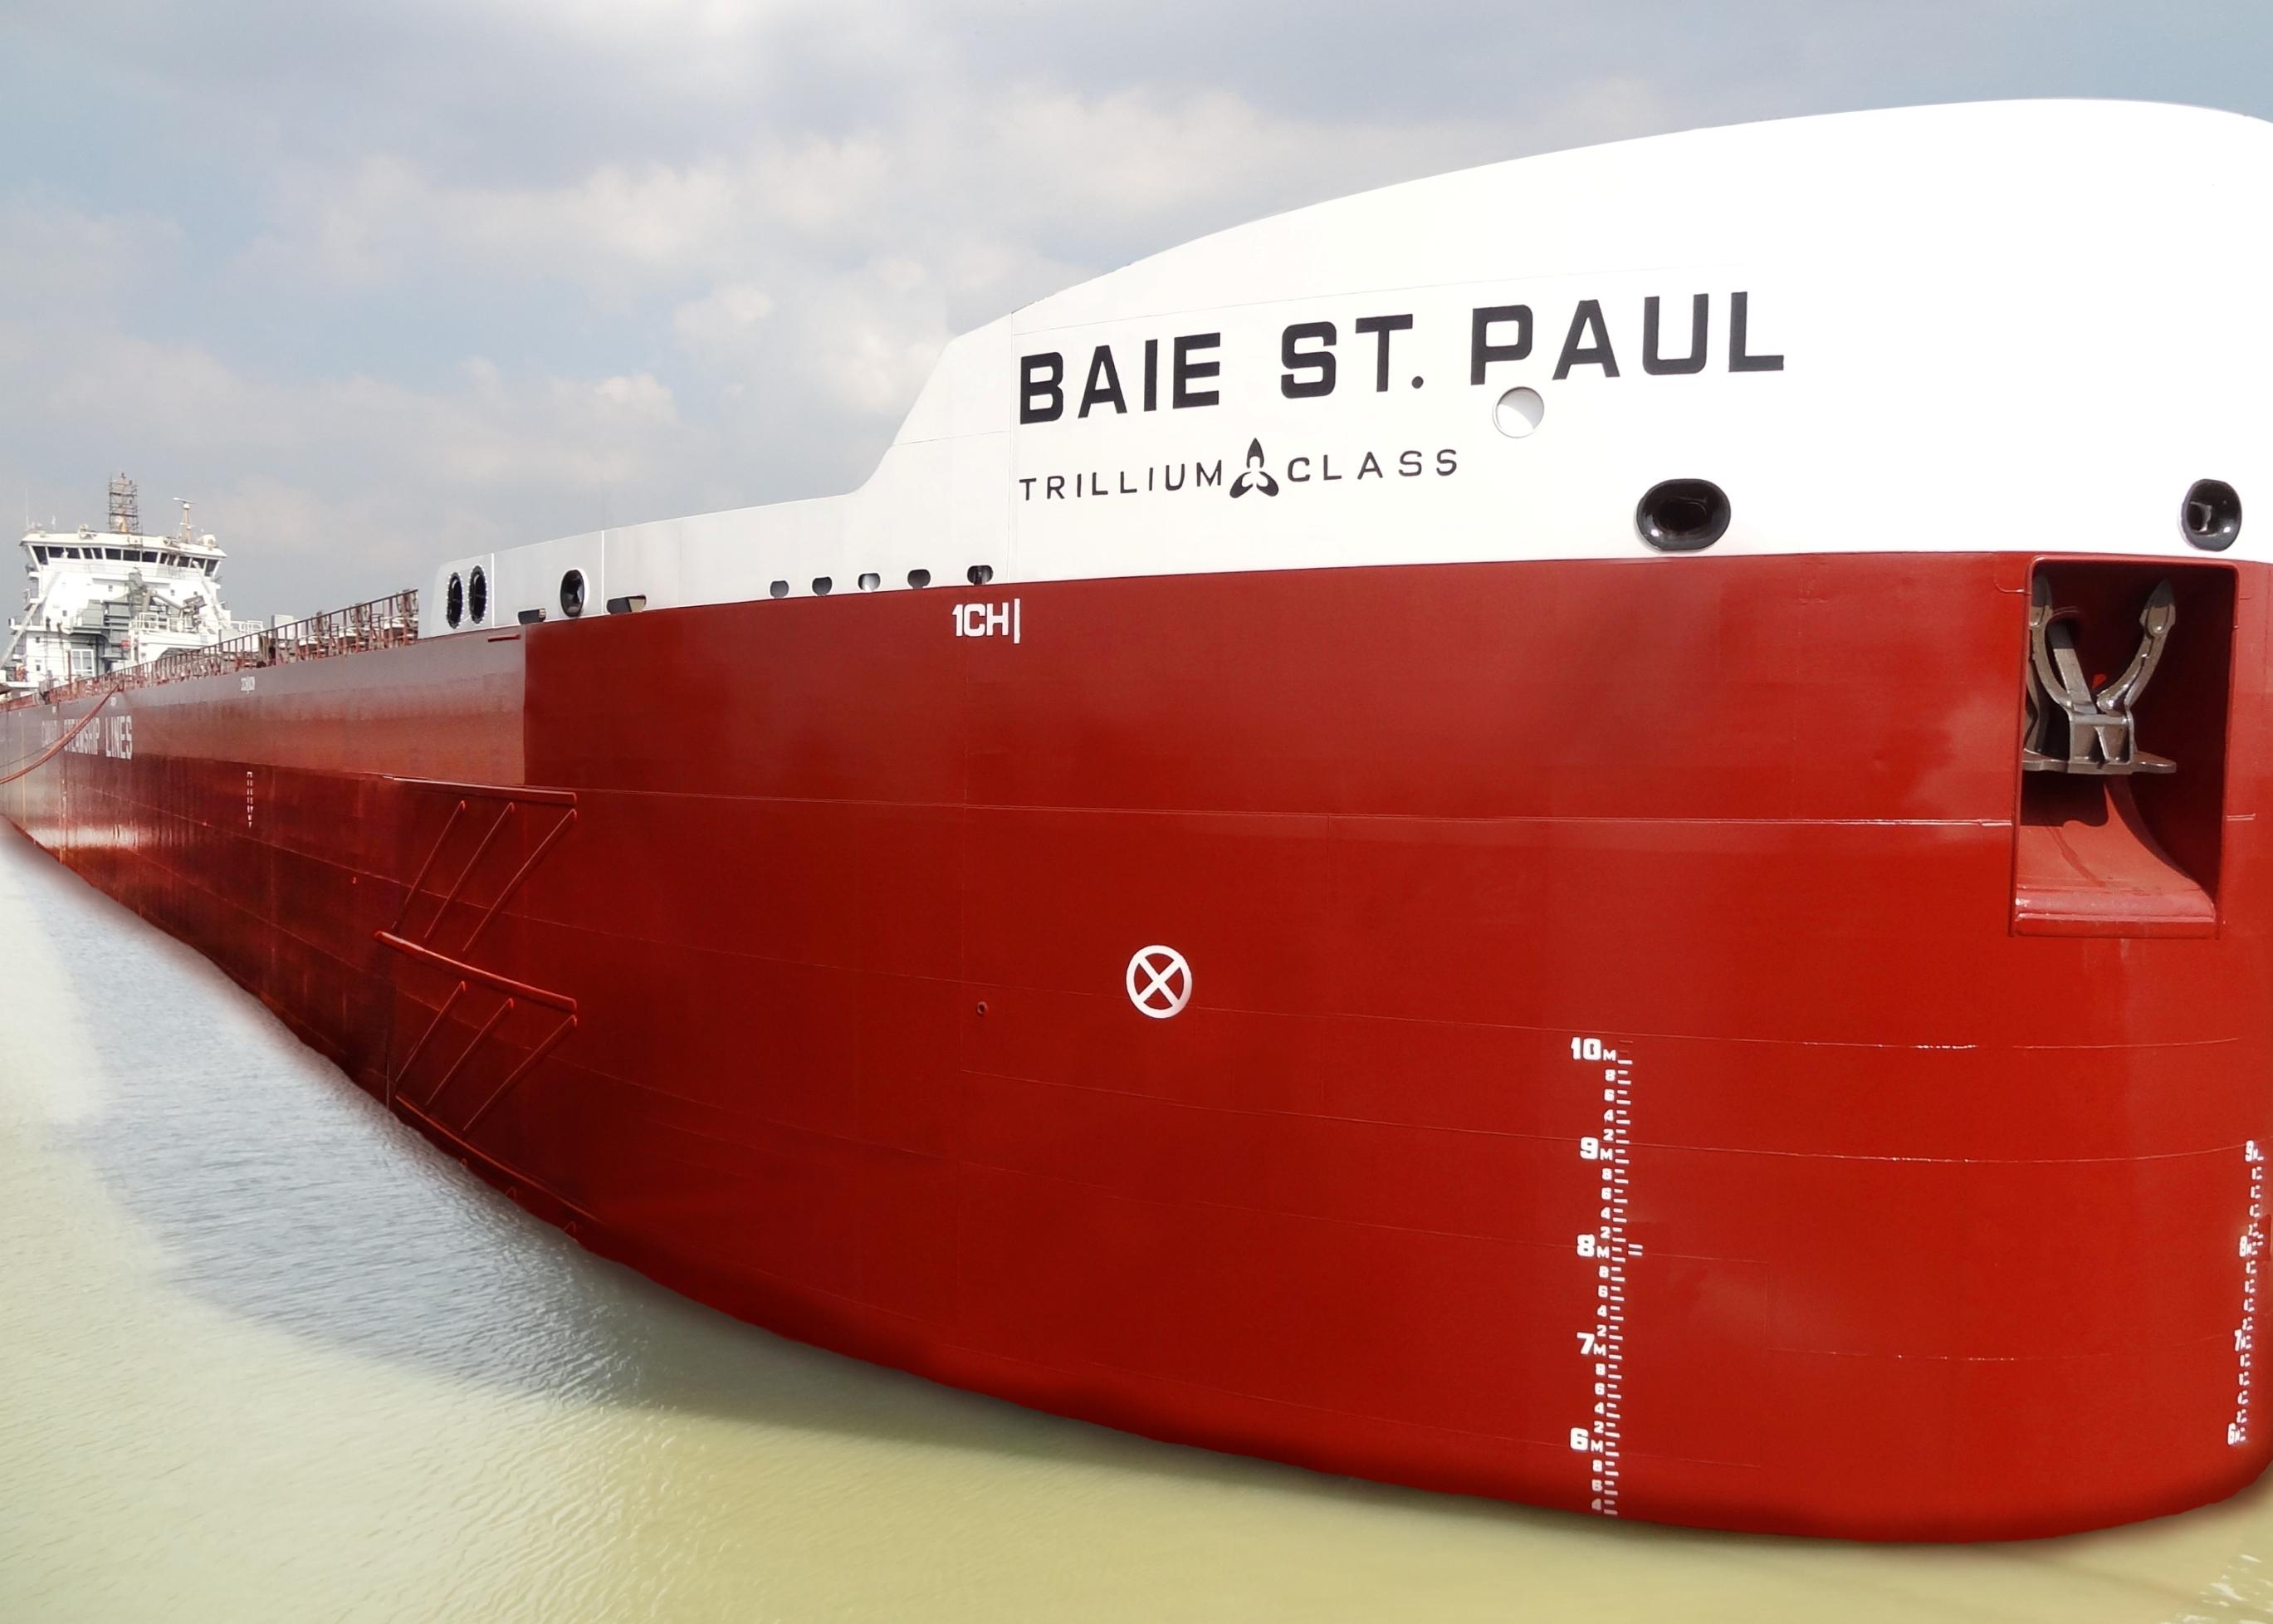 CSL has put a total of 11 newbuild Trillium Class vessels into operation since 2012